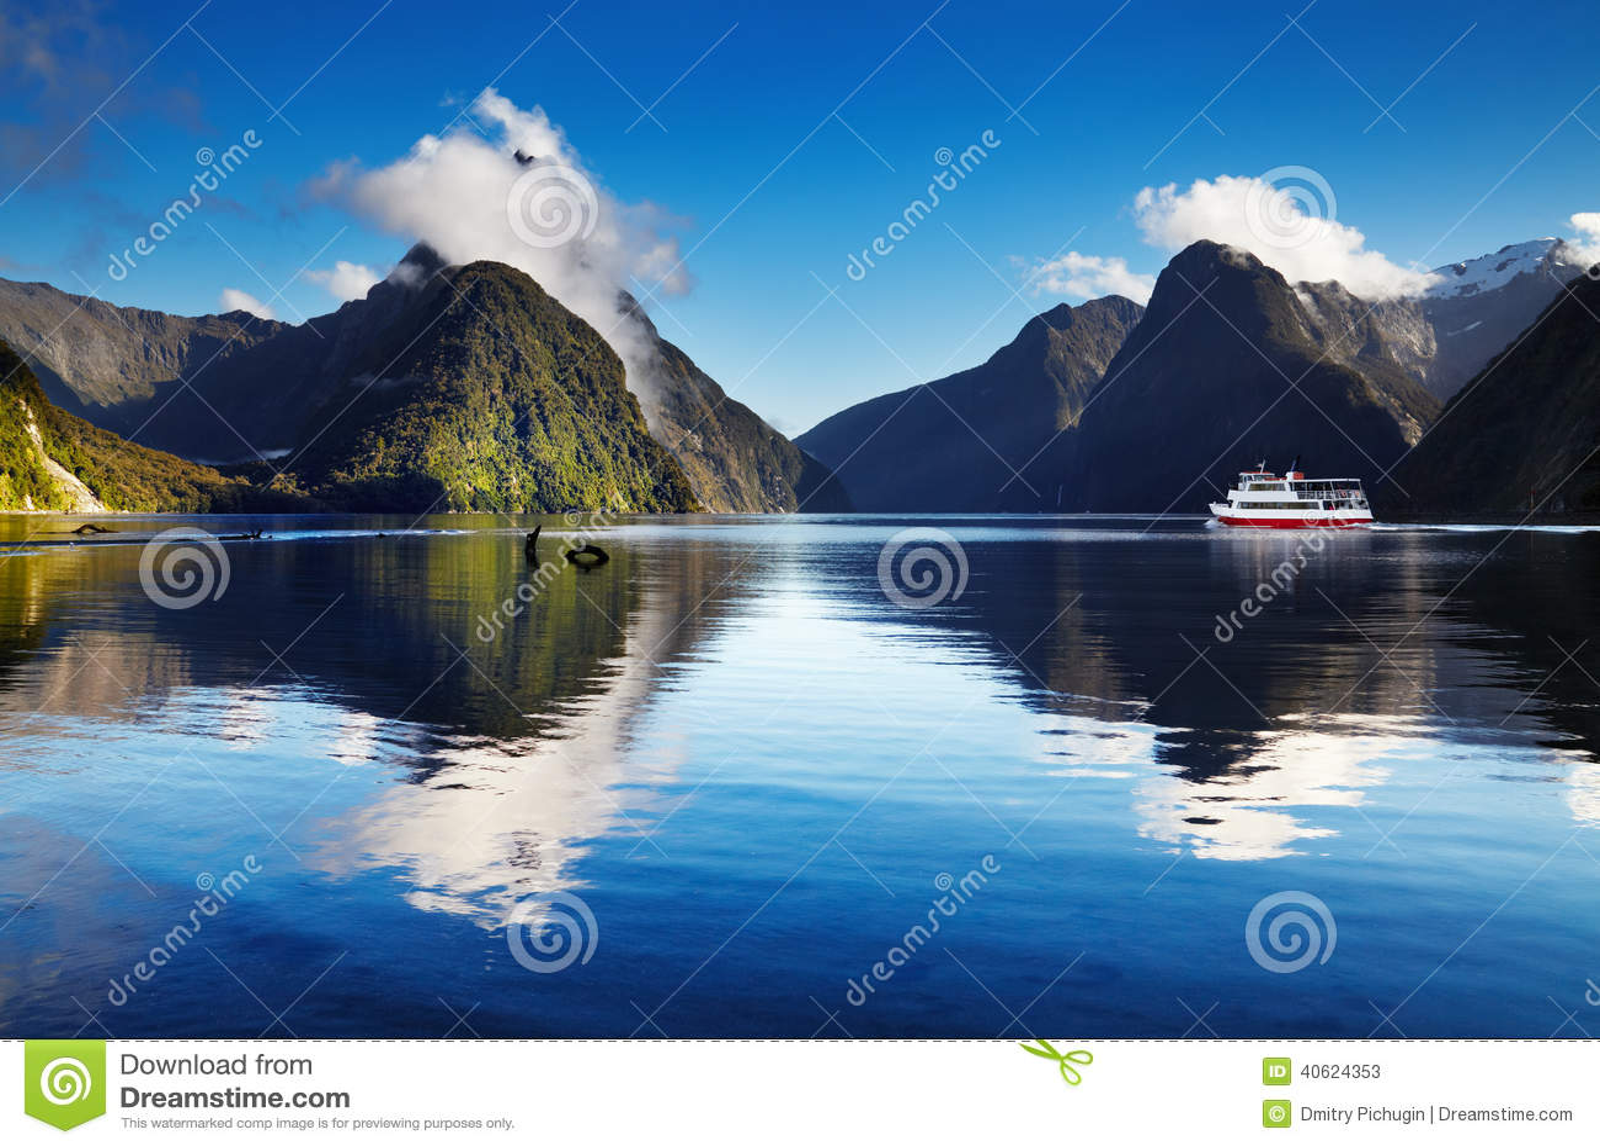 New Zealand Time Image: Milford Sound, New Zealand Stock Photo